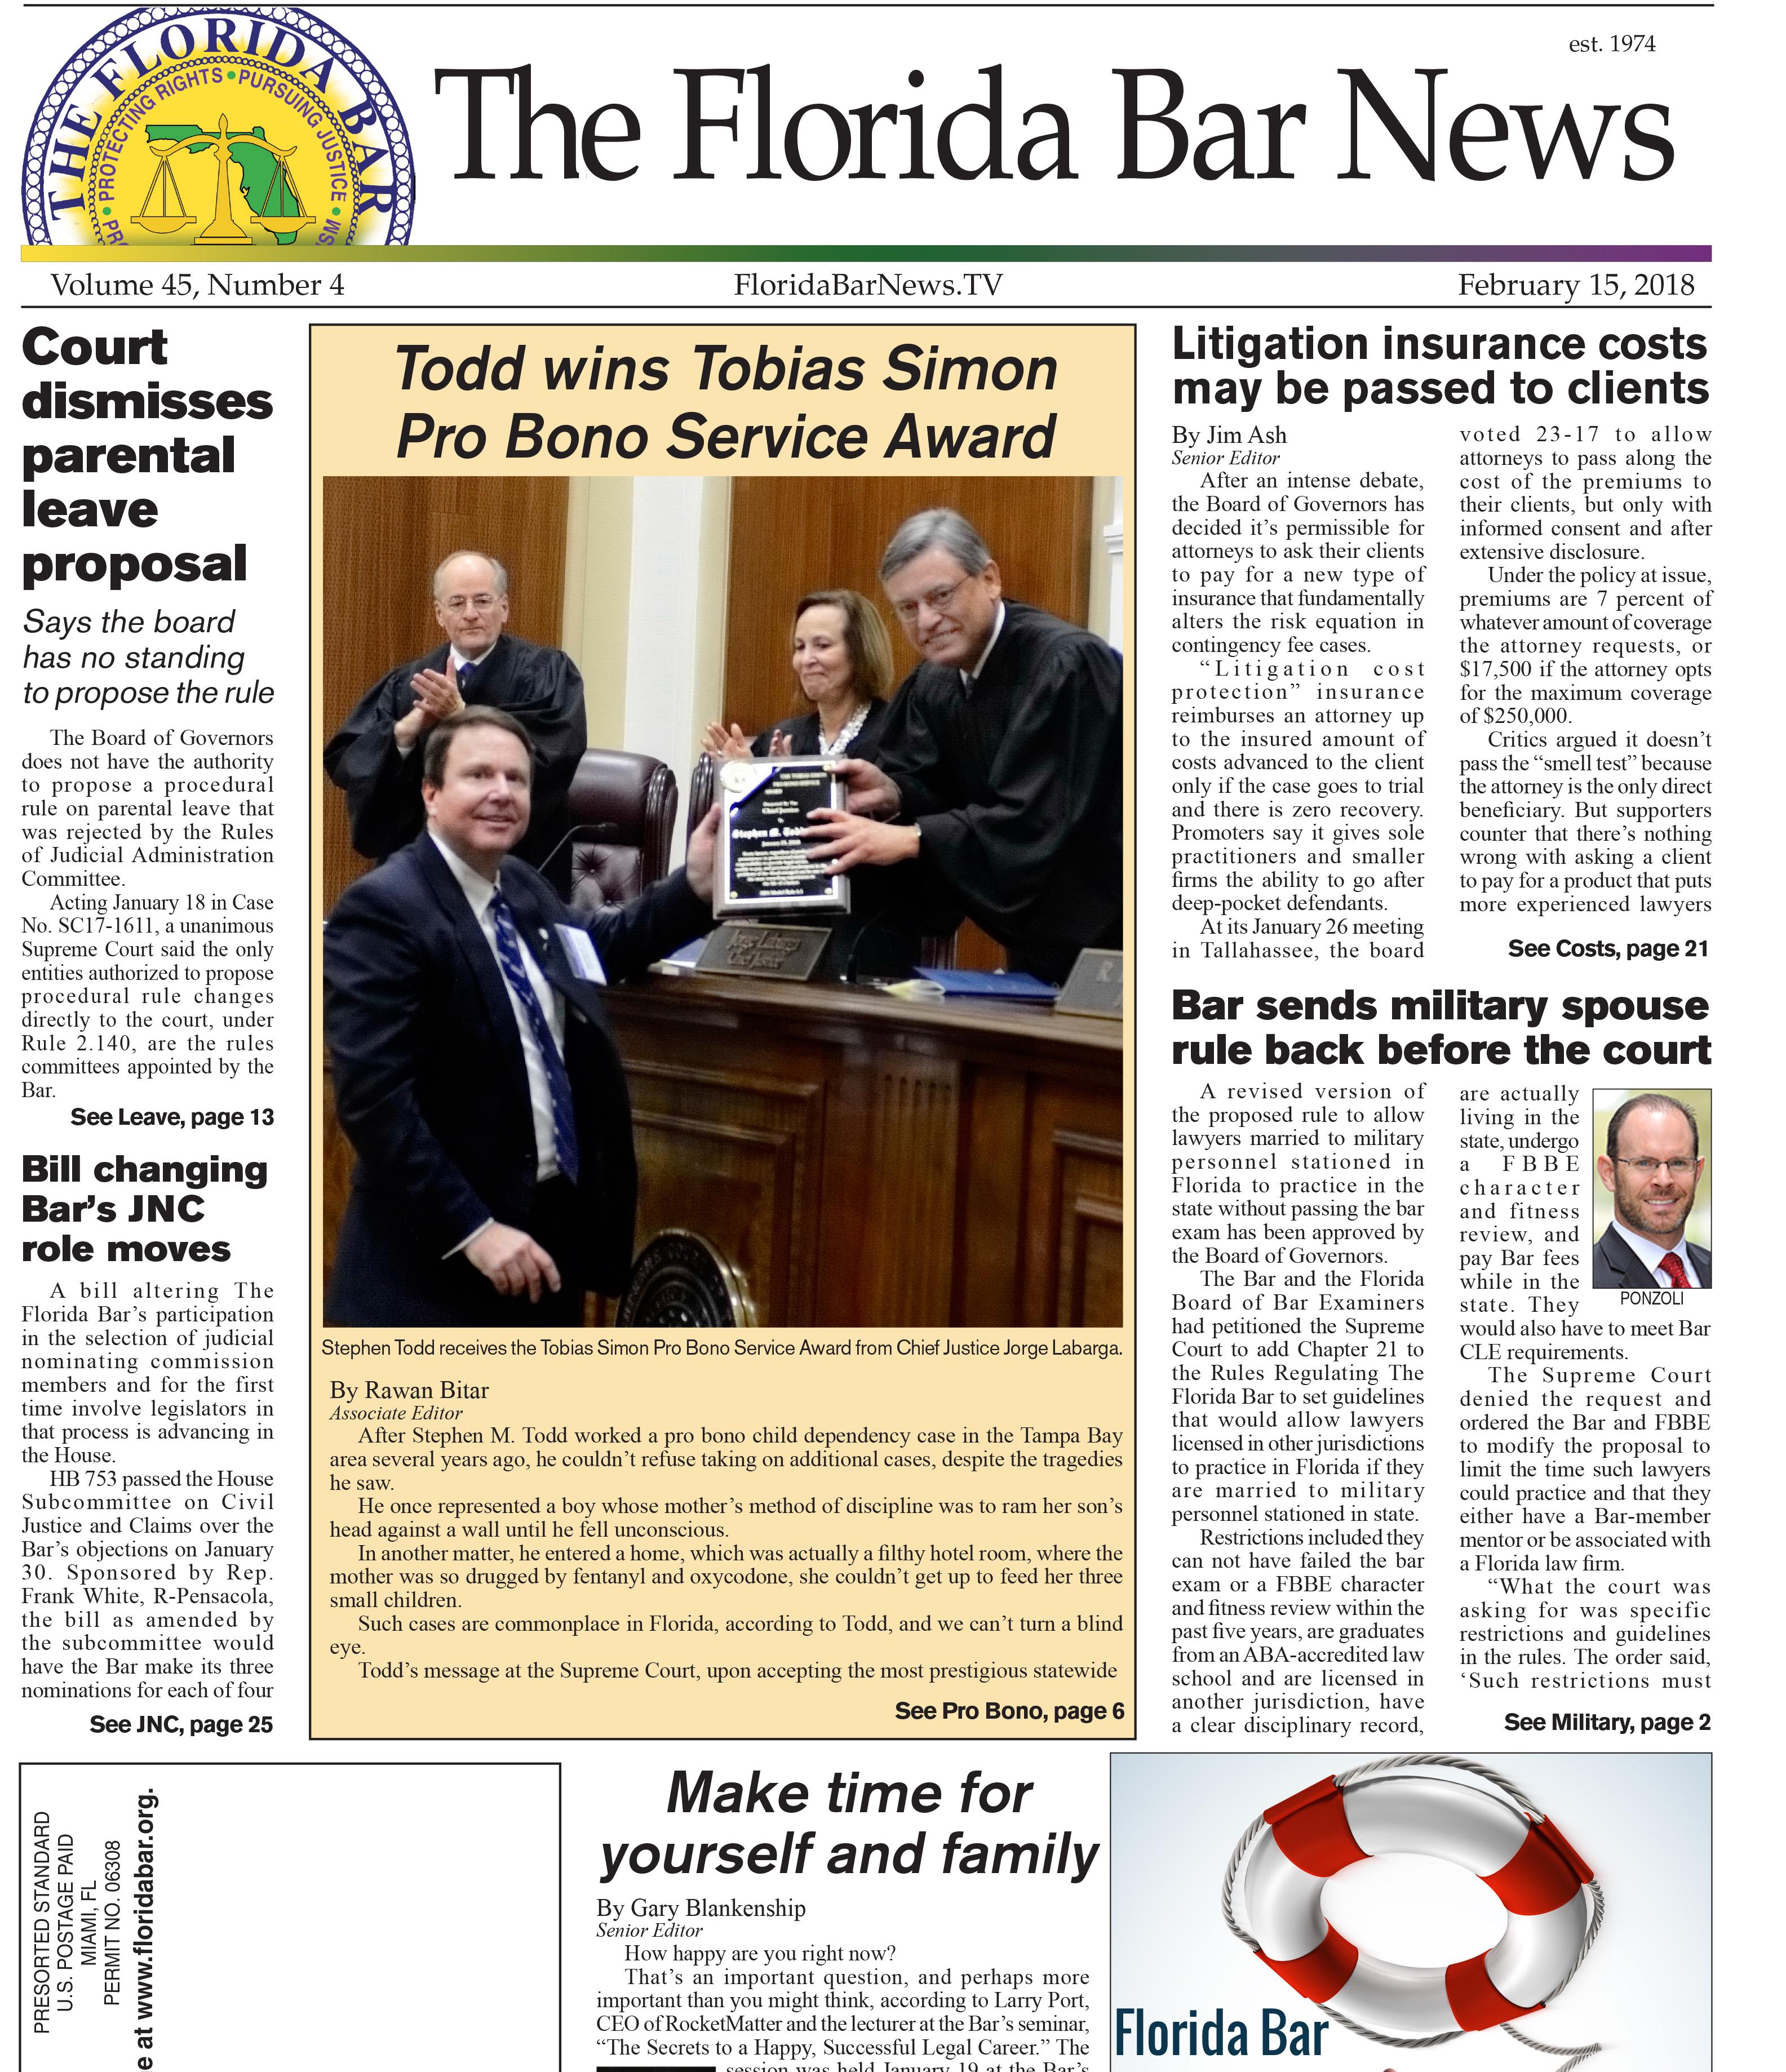 Bar News cover February 15, 2018